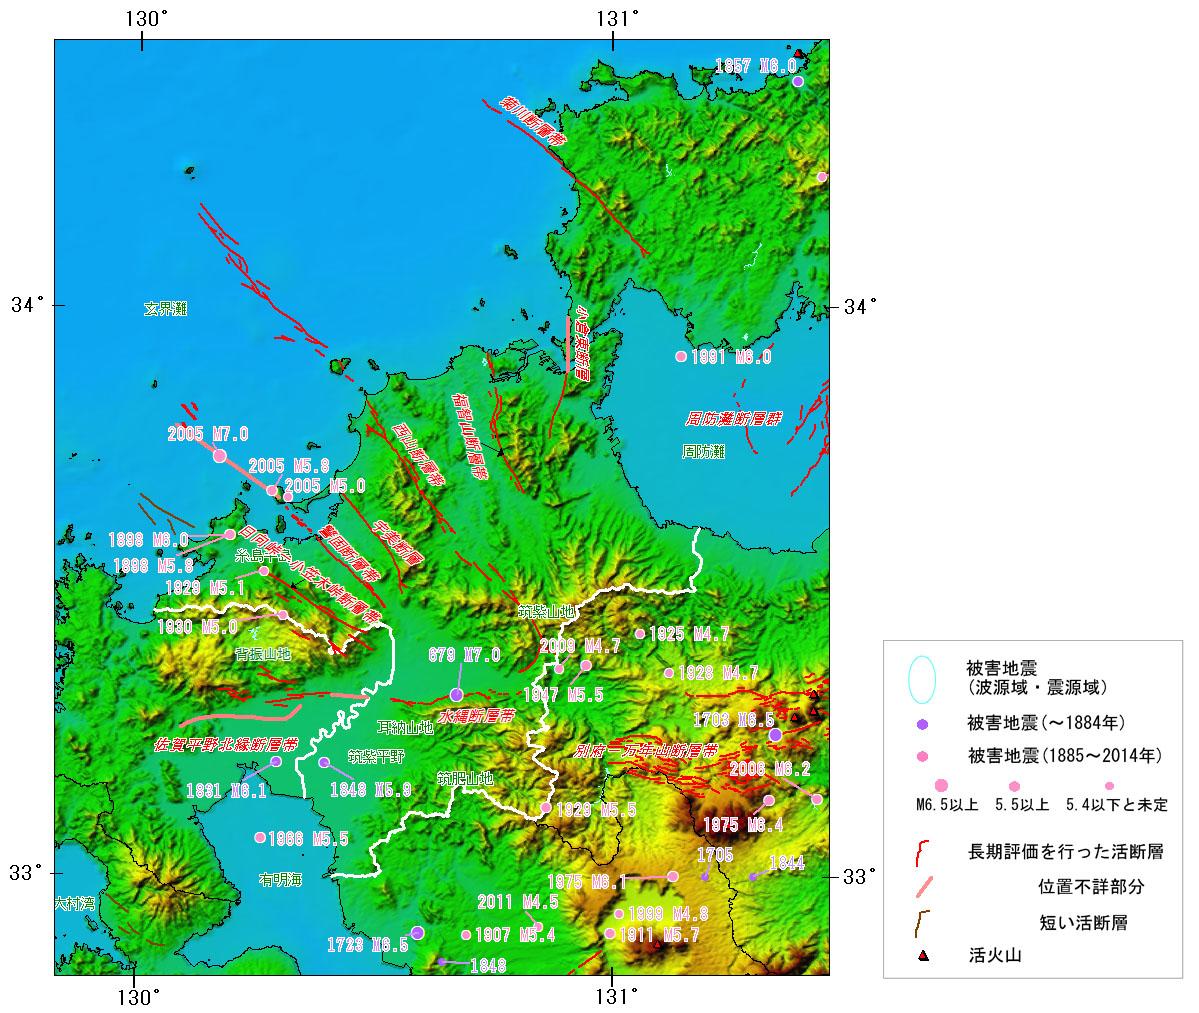 http://blog-imgs-95.fc2.com/o/k/a/okarutojishinyogen/news_1461076411_4401.jpg